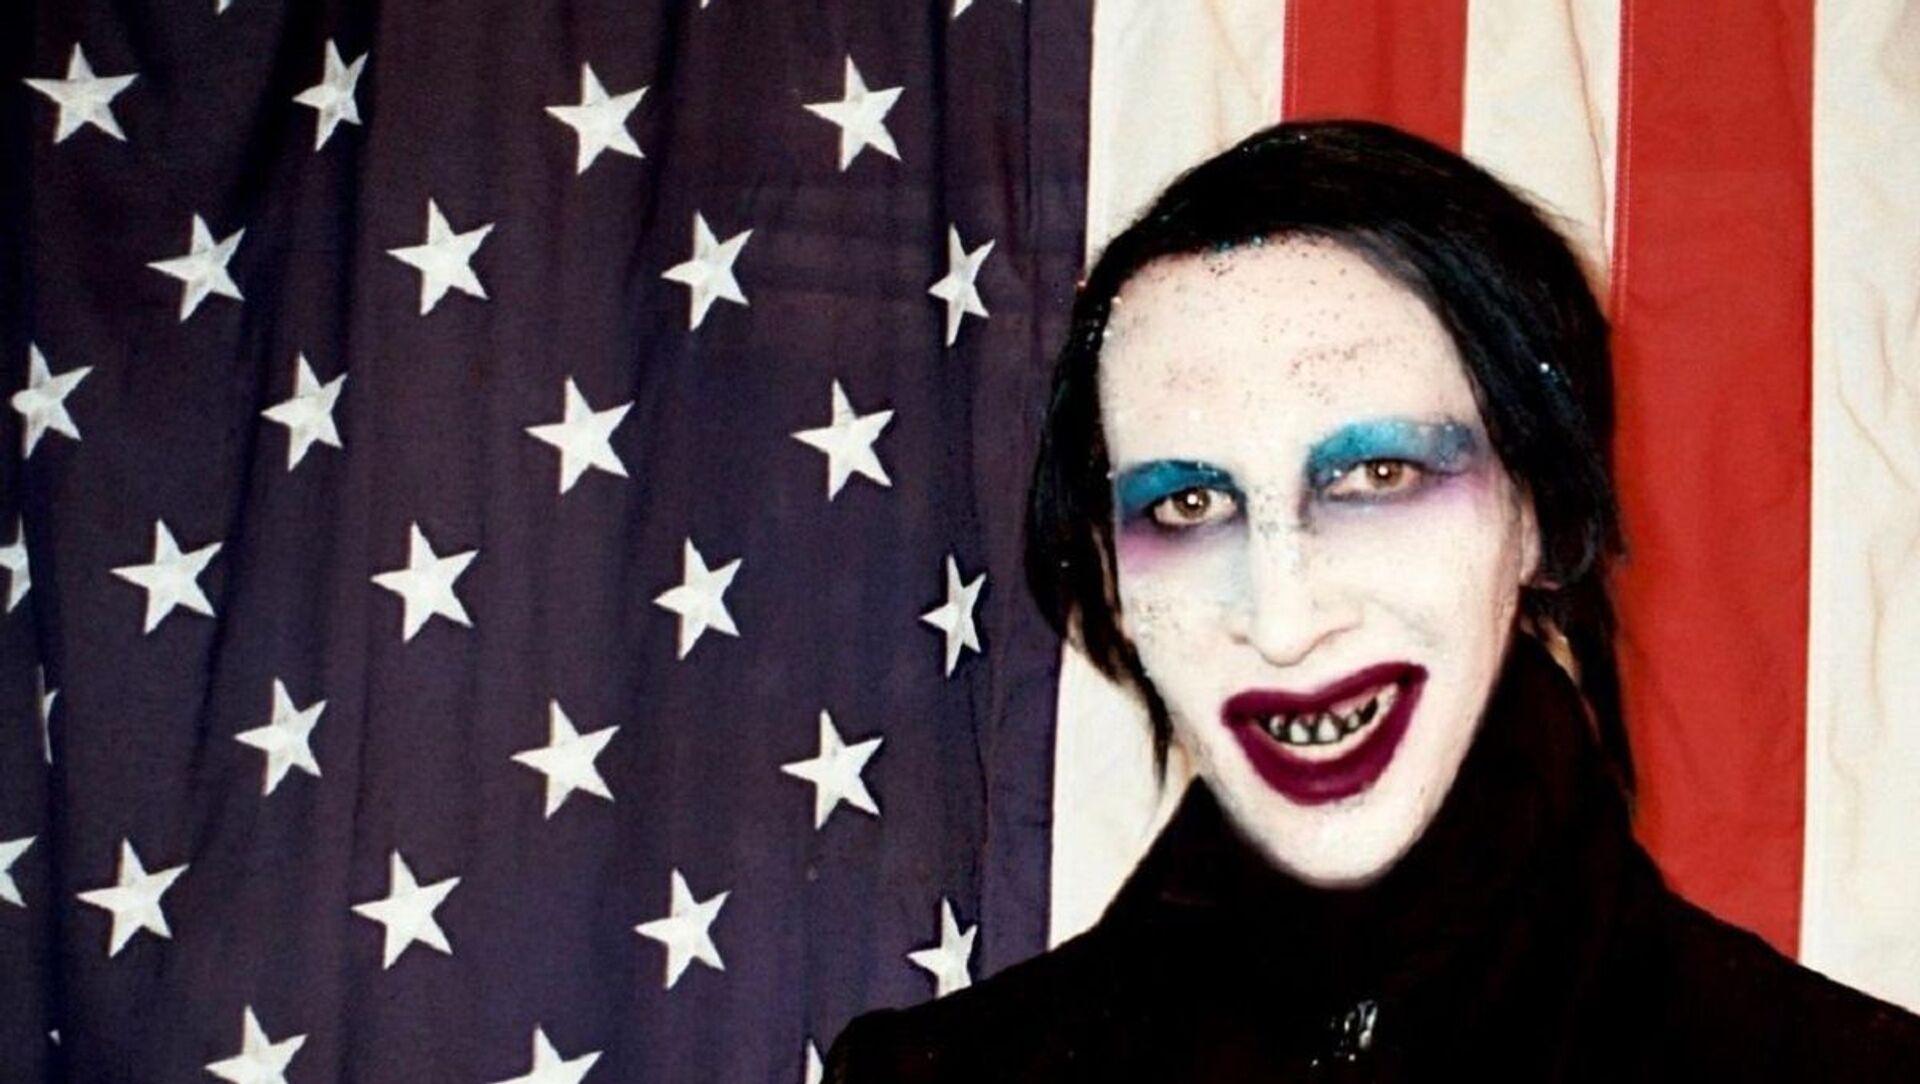 Marilyn Manson, cantante estadounidense - Sputnik Mundo, 1920, 06.02.2021